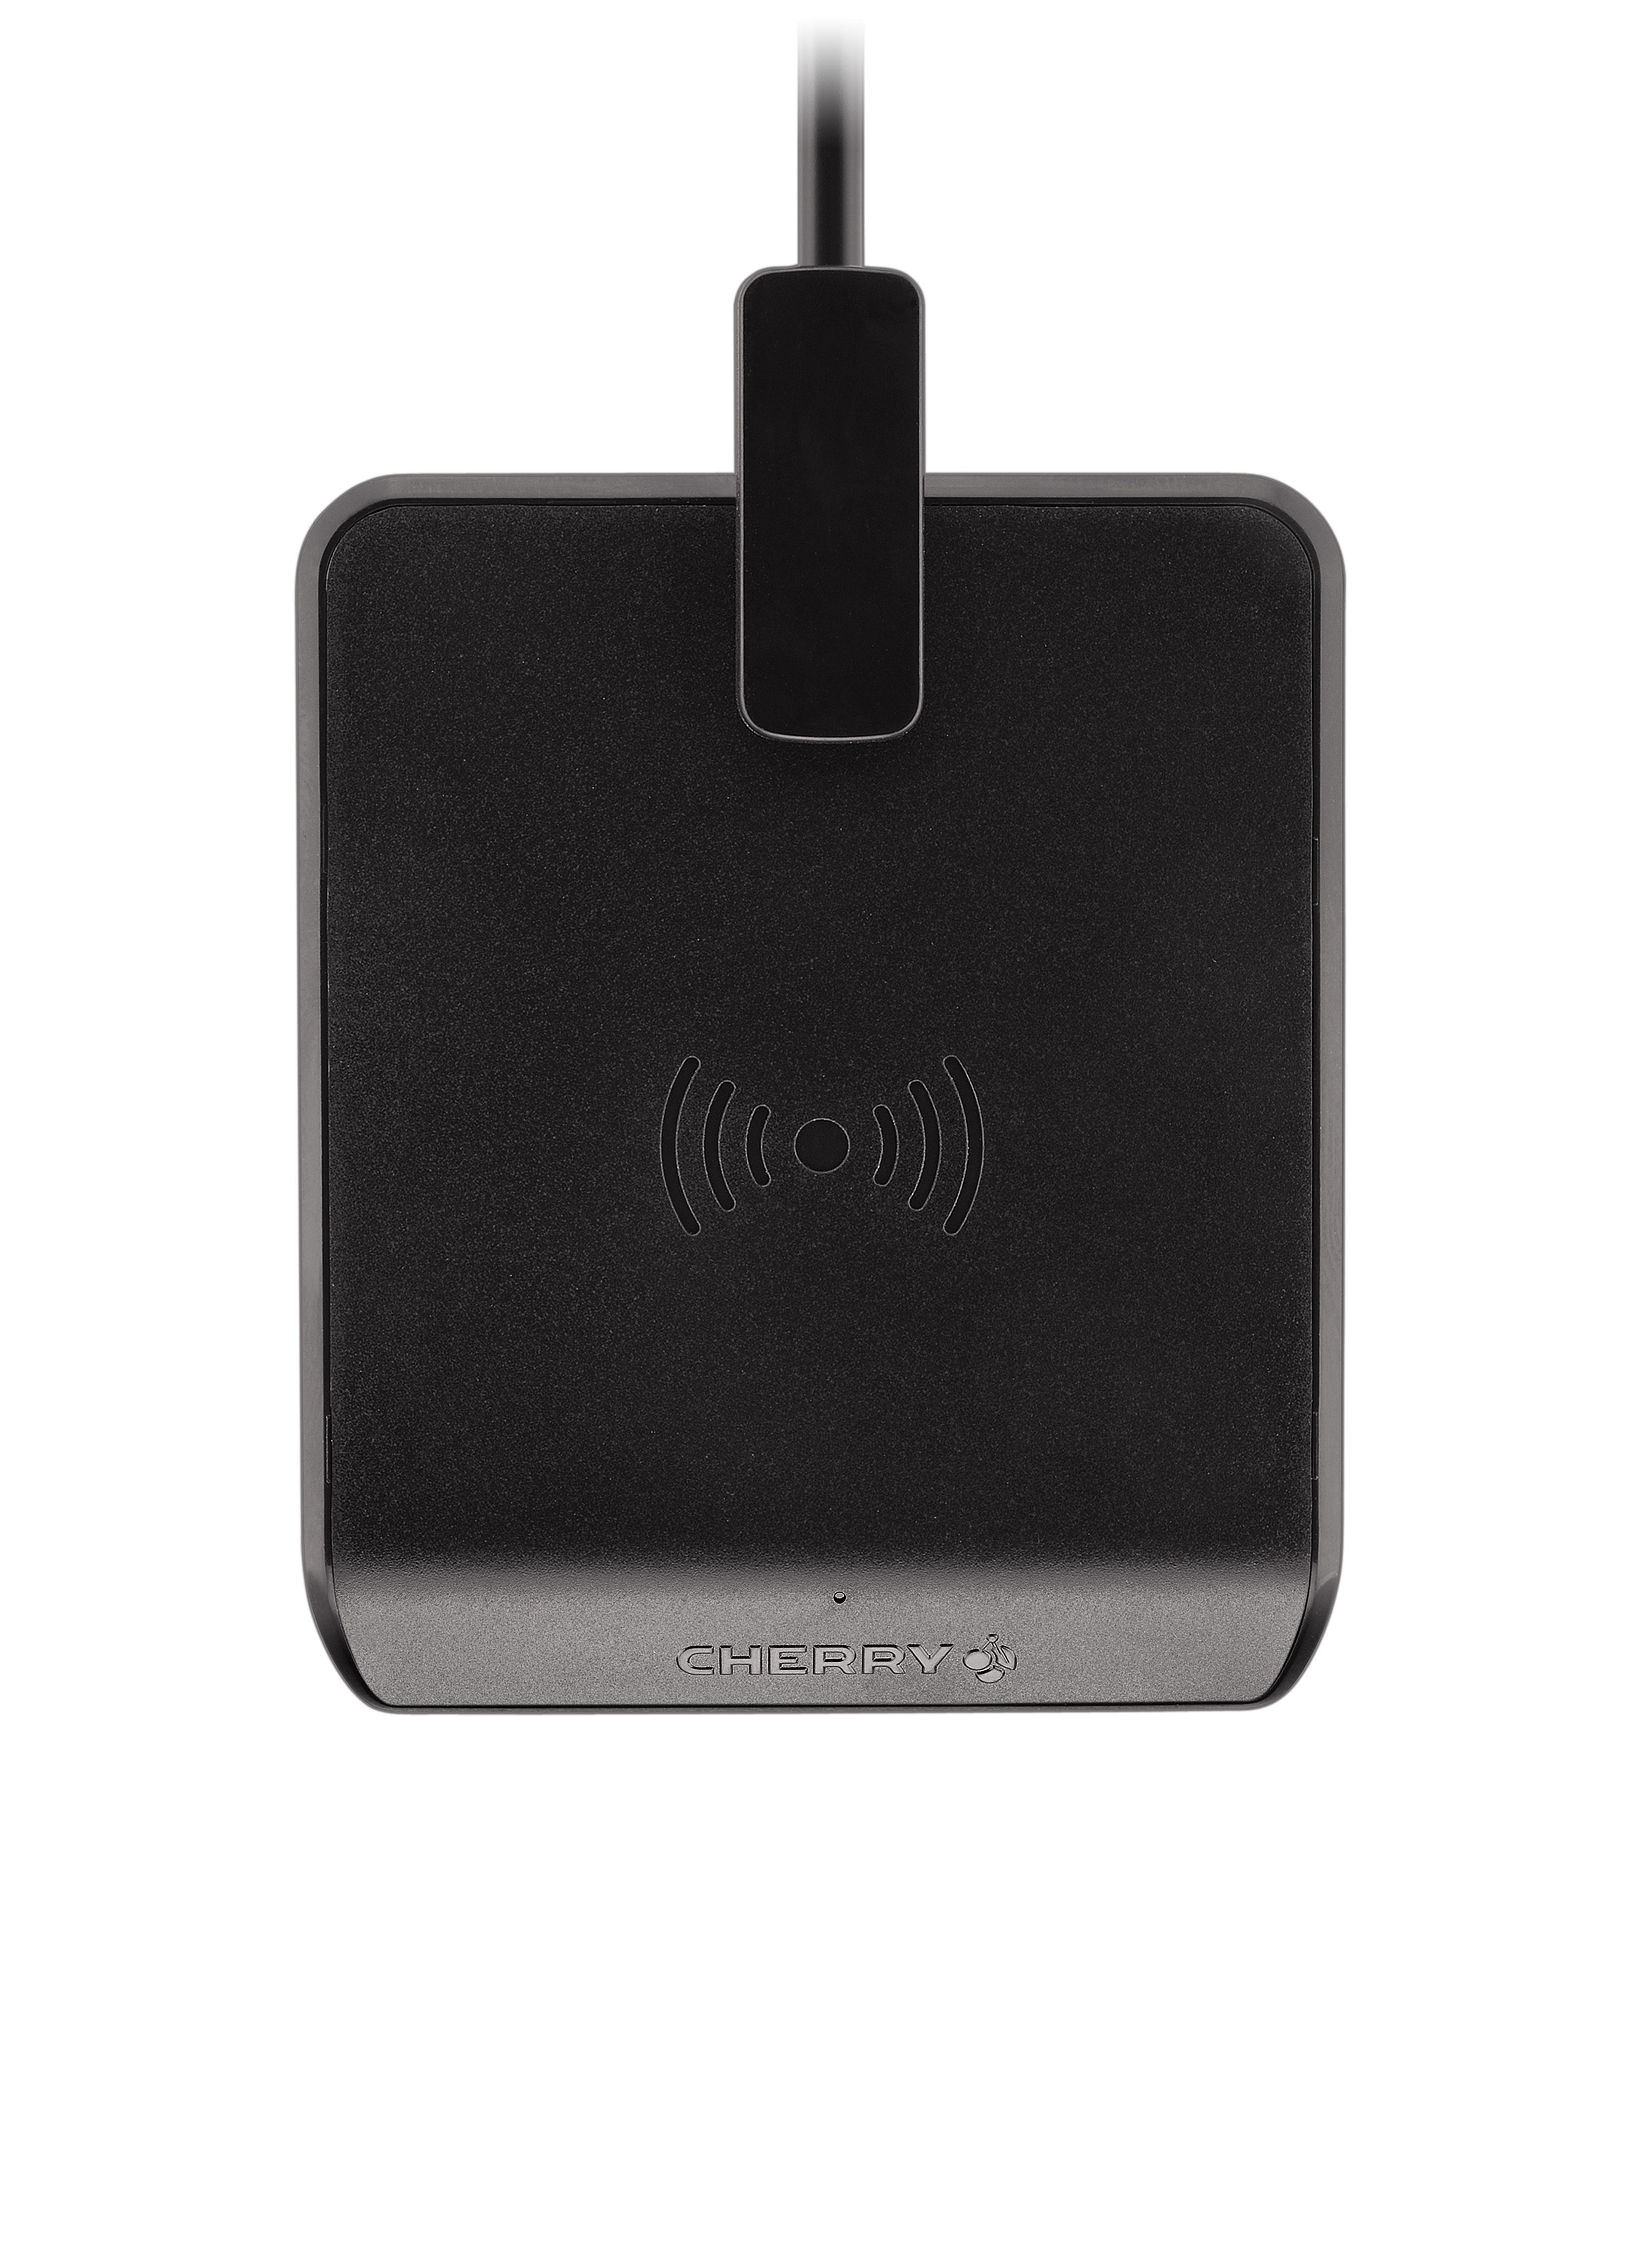 CHERRY SmartCardTerminal TC 1200 USB Klasse1 cardreader black